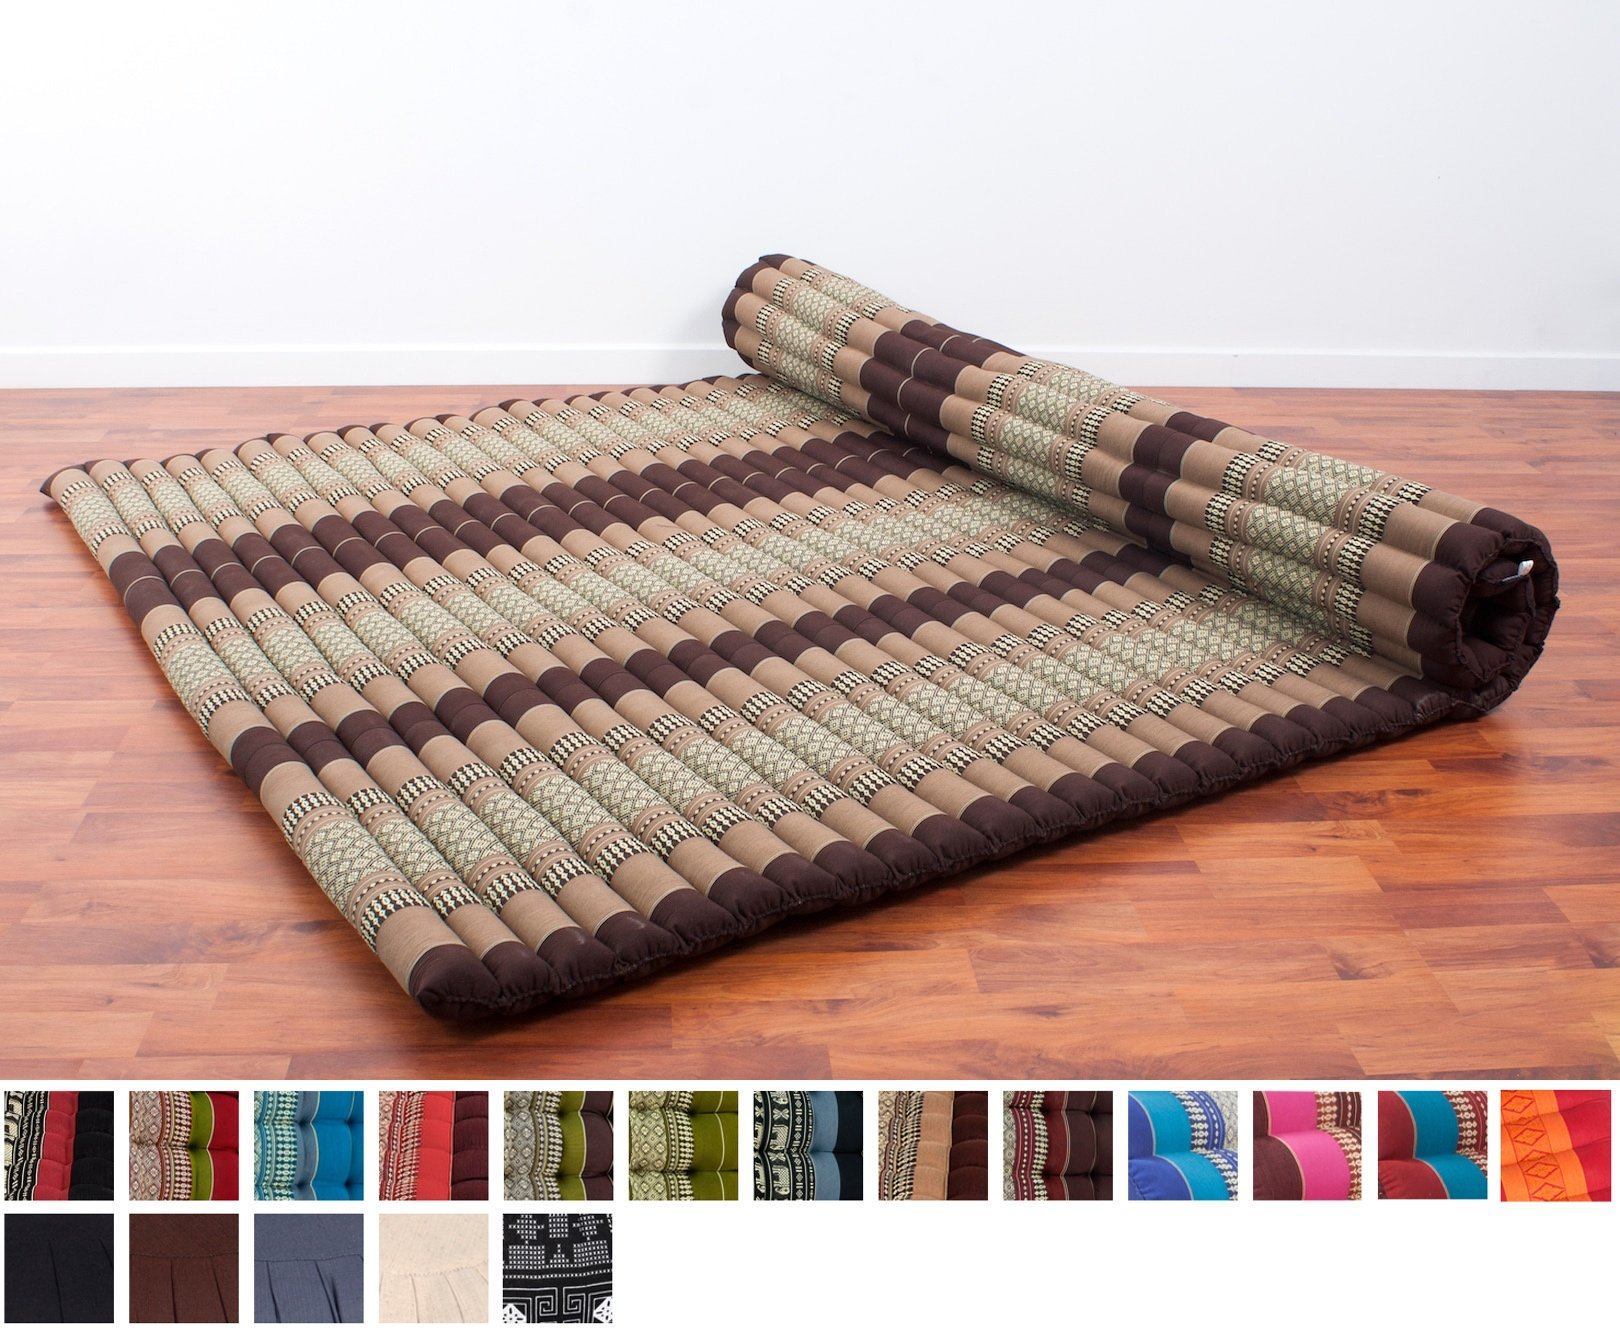 Leewadee Roll Up Thai Mattress XXL, 79x59x2 inches, Kapok Fabric, Brown, Premium Double Stitched